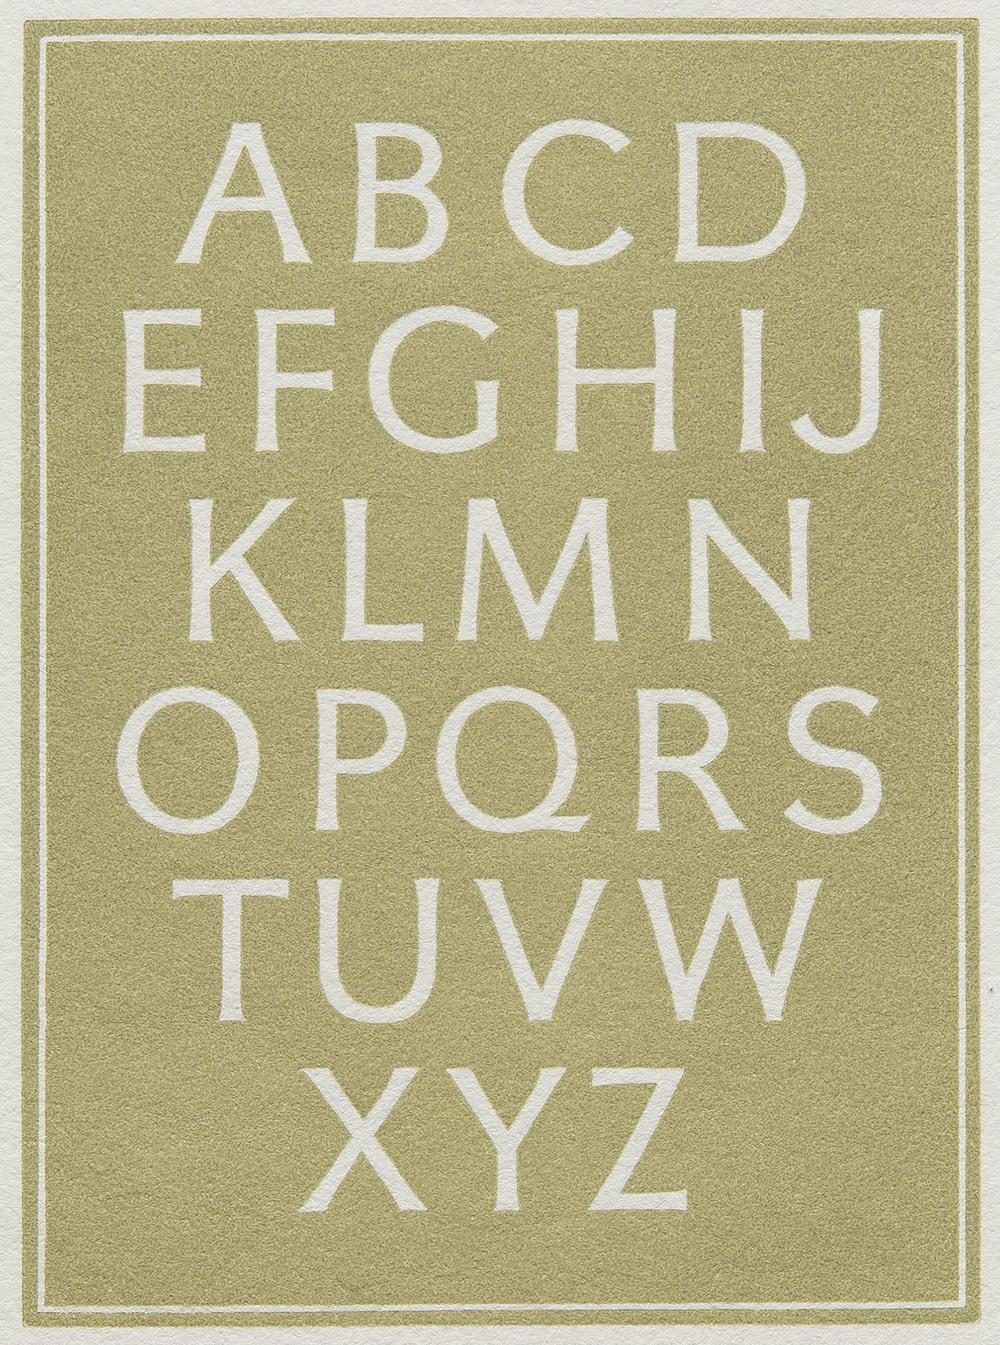 Leo Wyatt, detail of wood engraved plate in  Little Book of Alphabet s, The Florin Press, Biddenden Kent, 1985, 8 x 11 cm